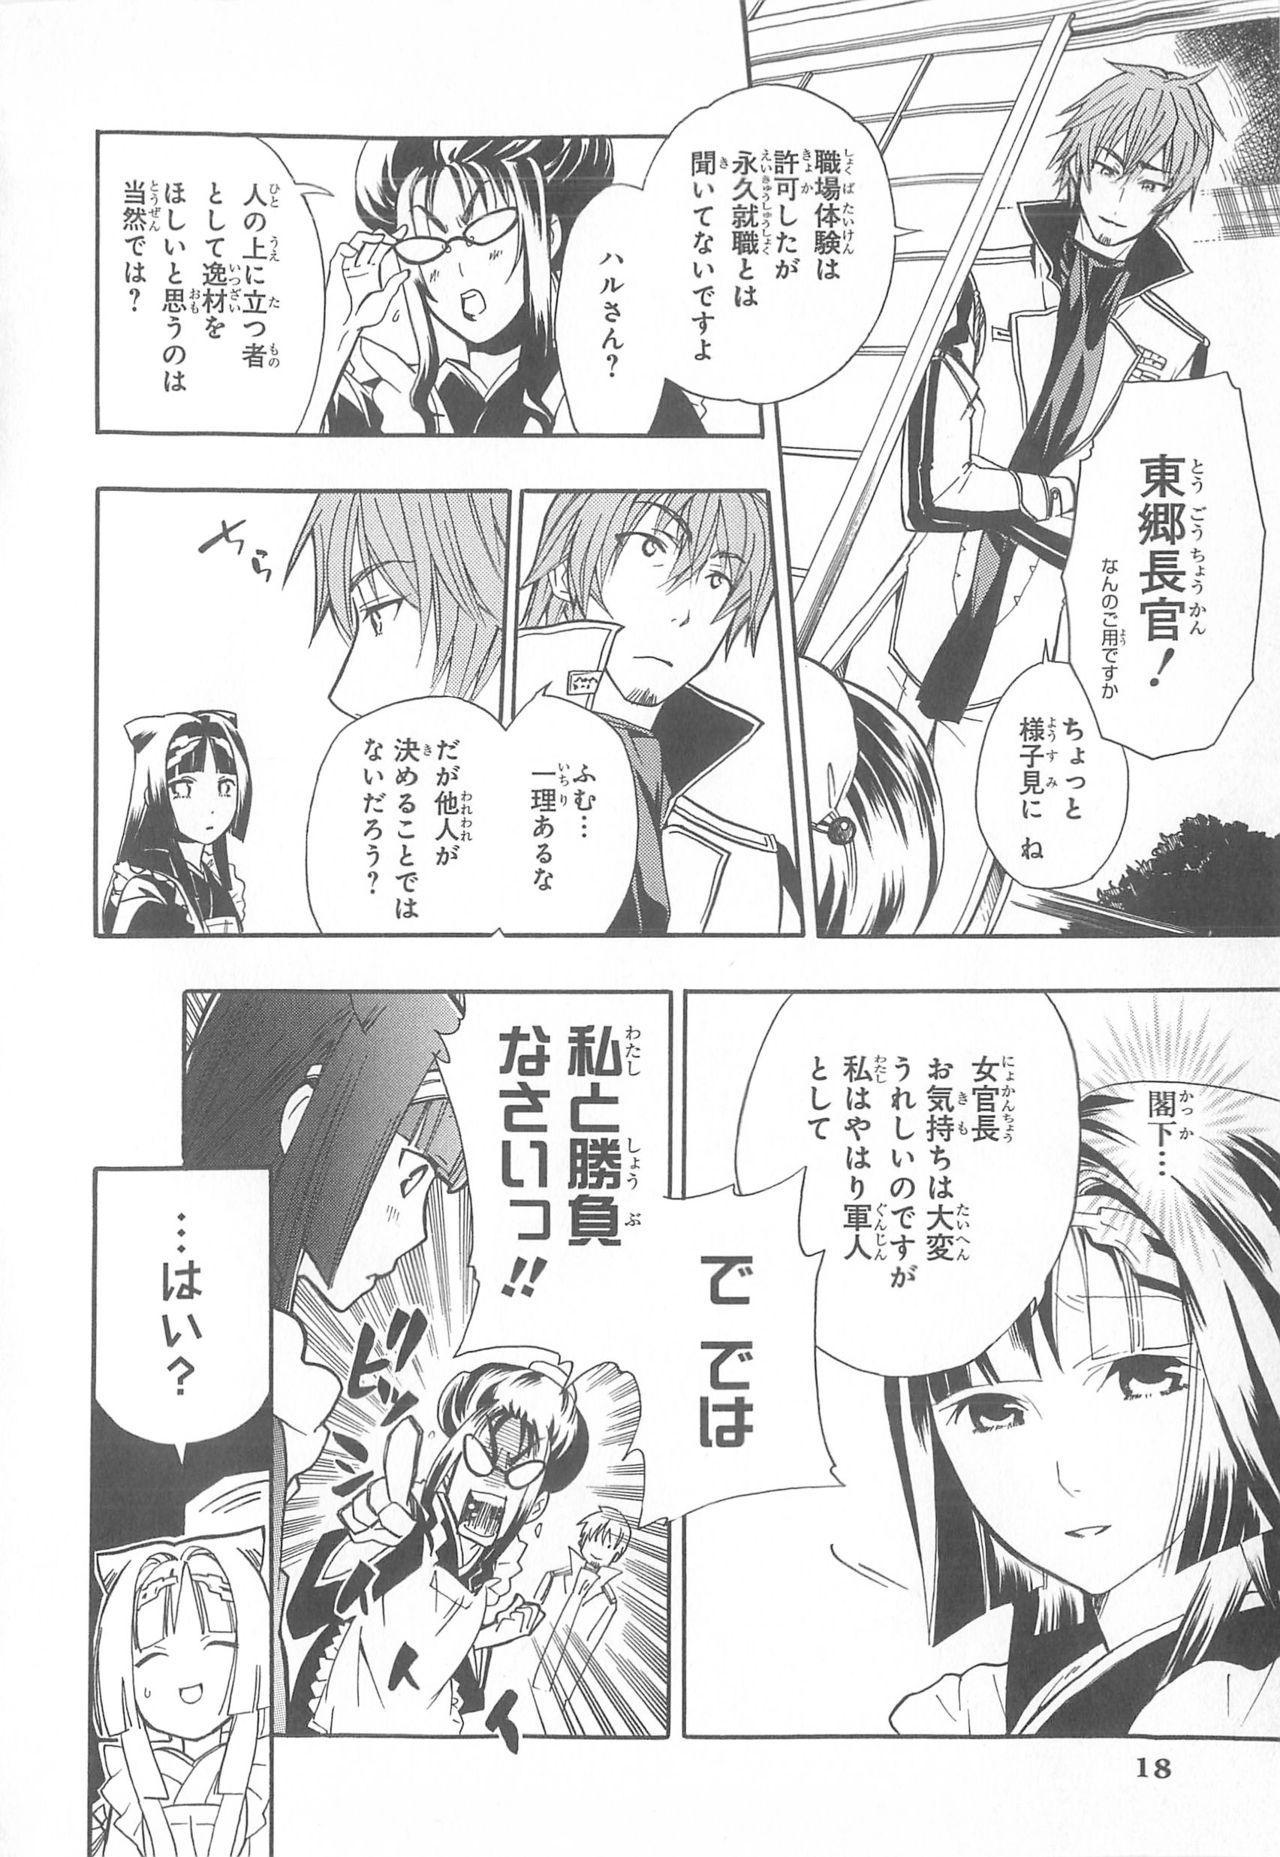 Daiteikoku comic Anthology vol.2 18